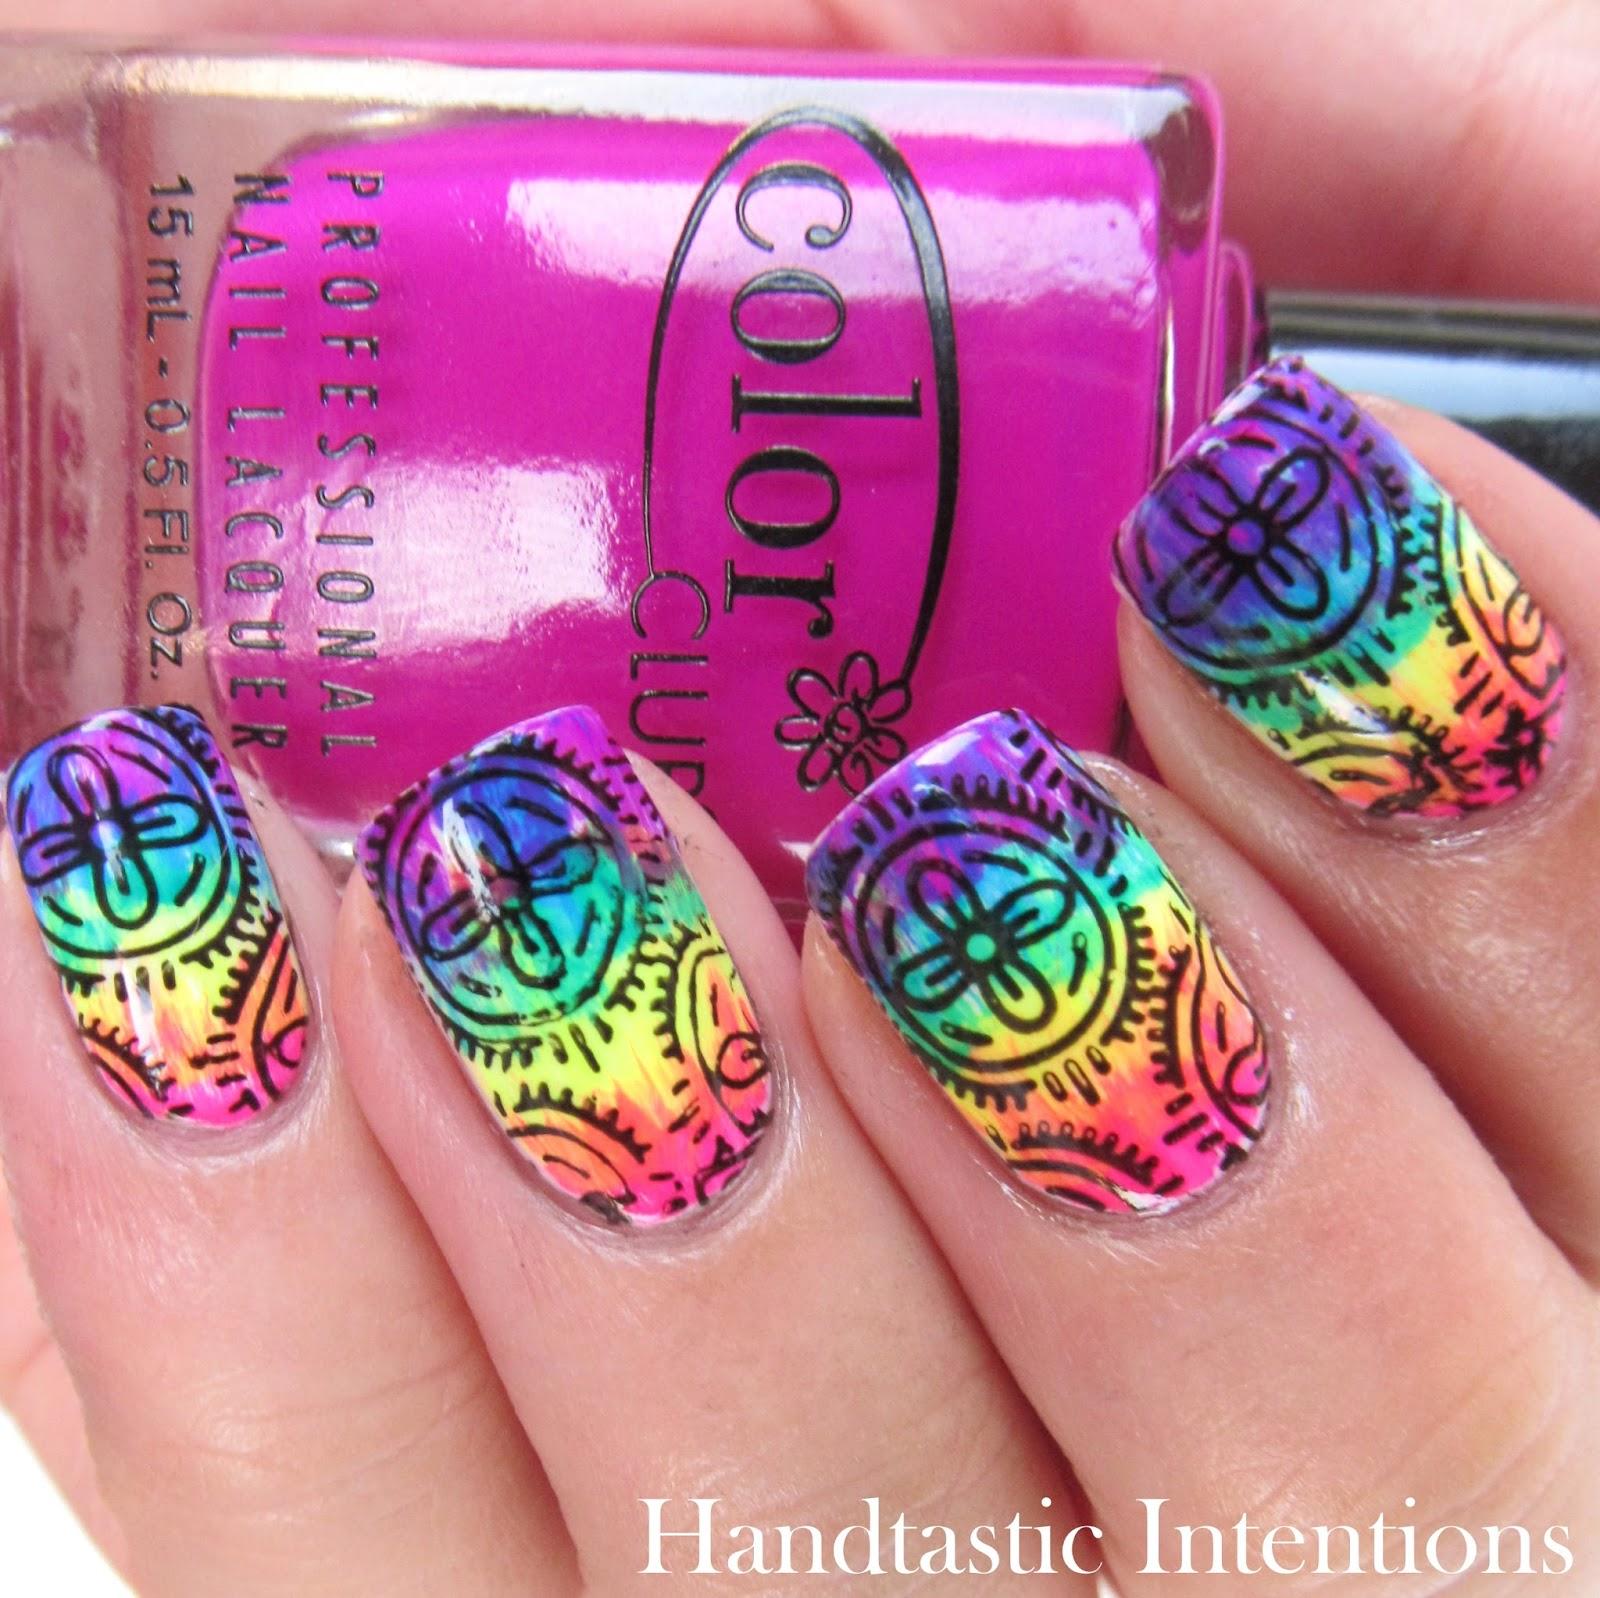 Handtastic Intentions: Neon Week Nail Art: Neon Rainbow Flowers